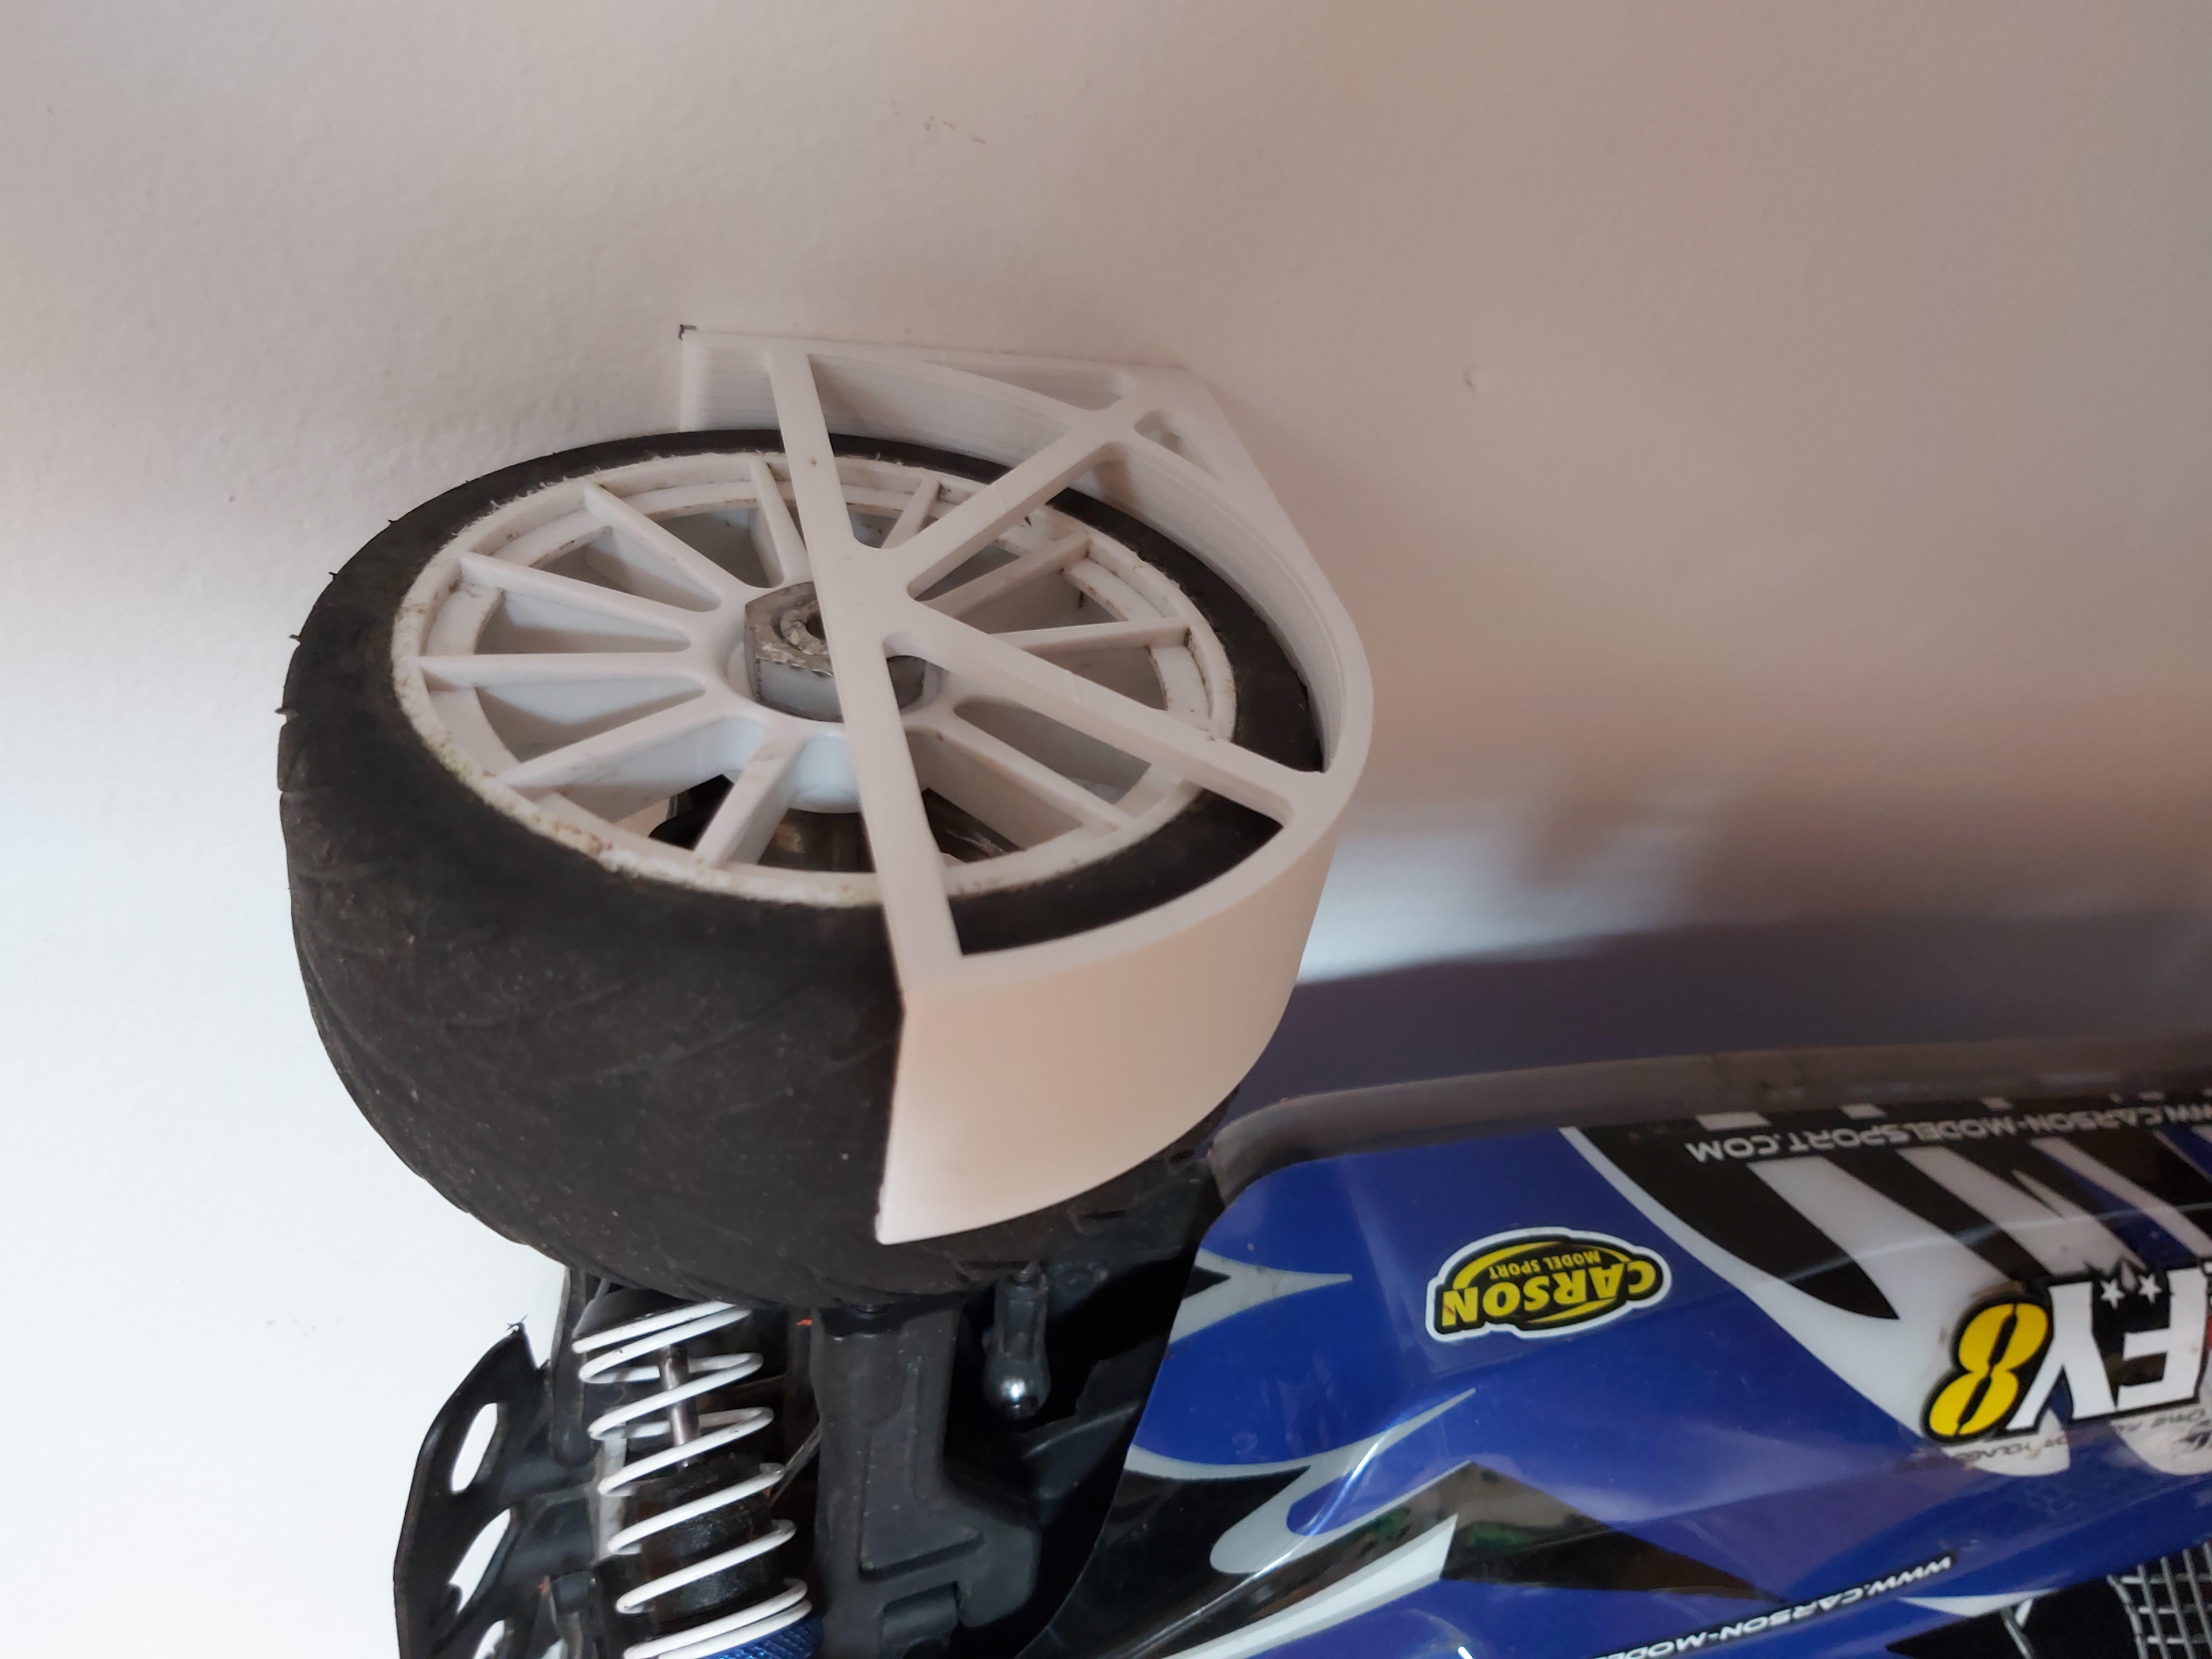 20200523_145807.jpg Download free STL file Rc Car wall mount • 3D print template, DB46